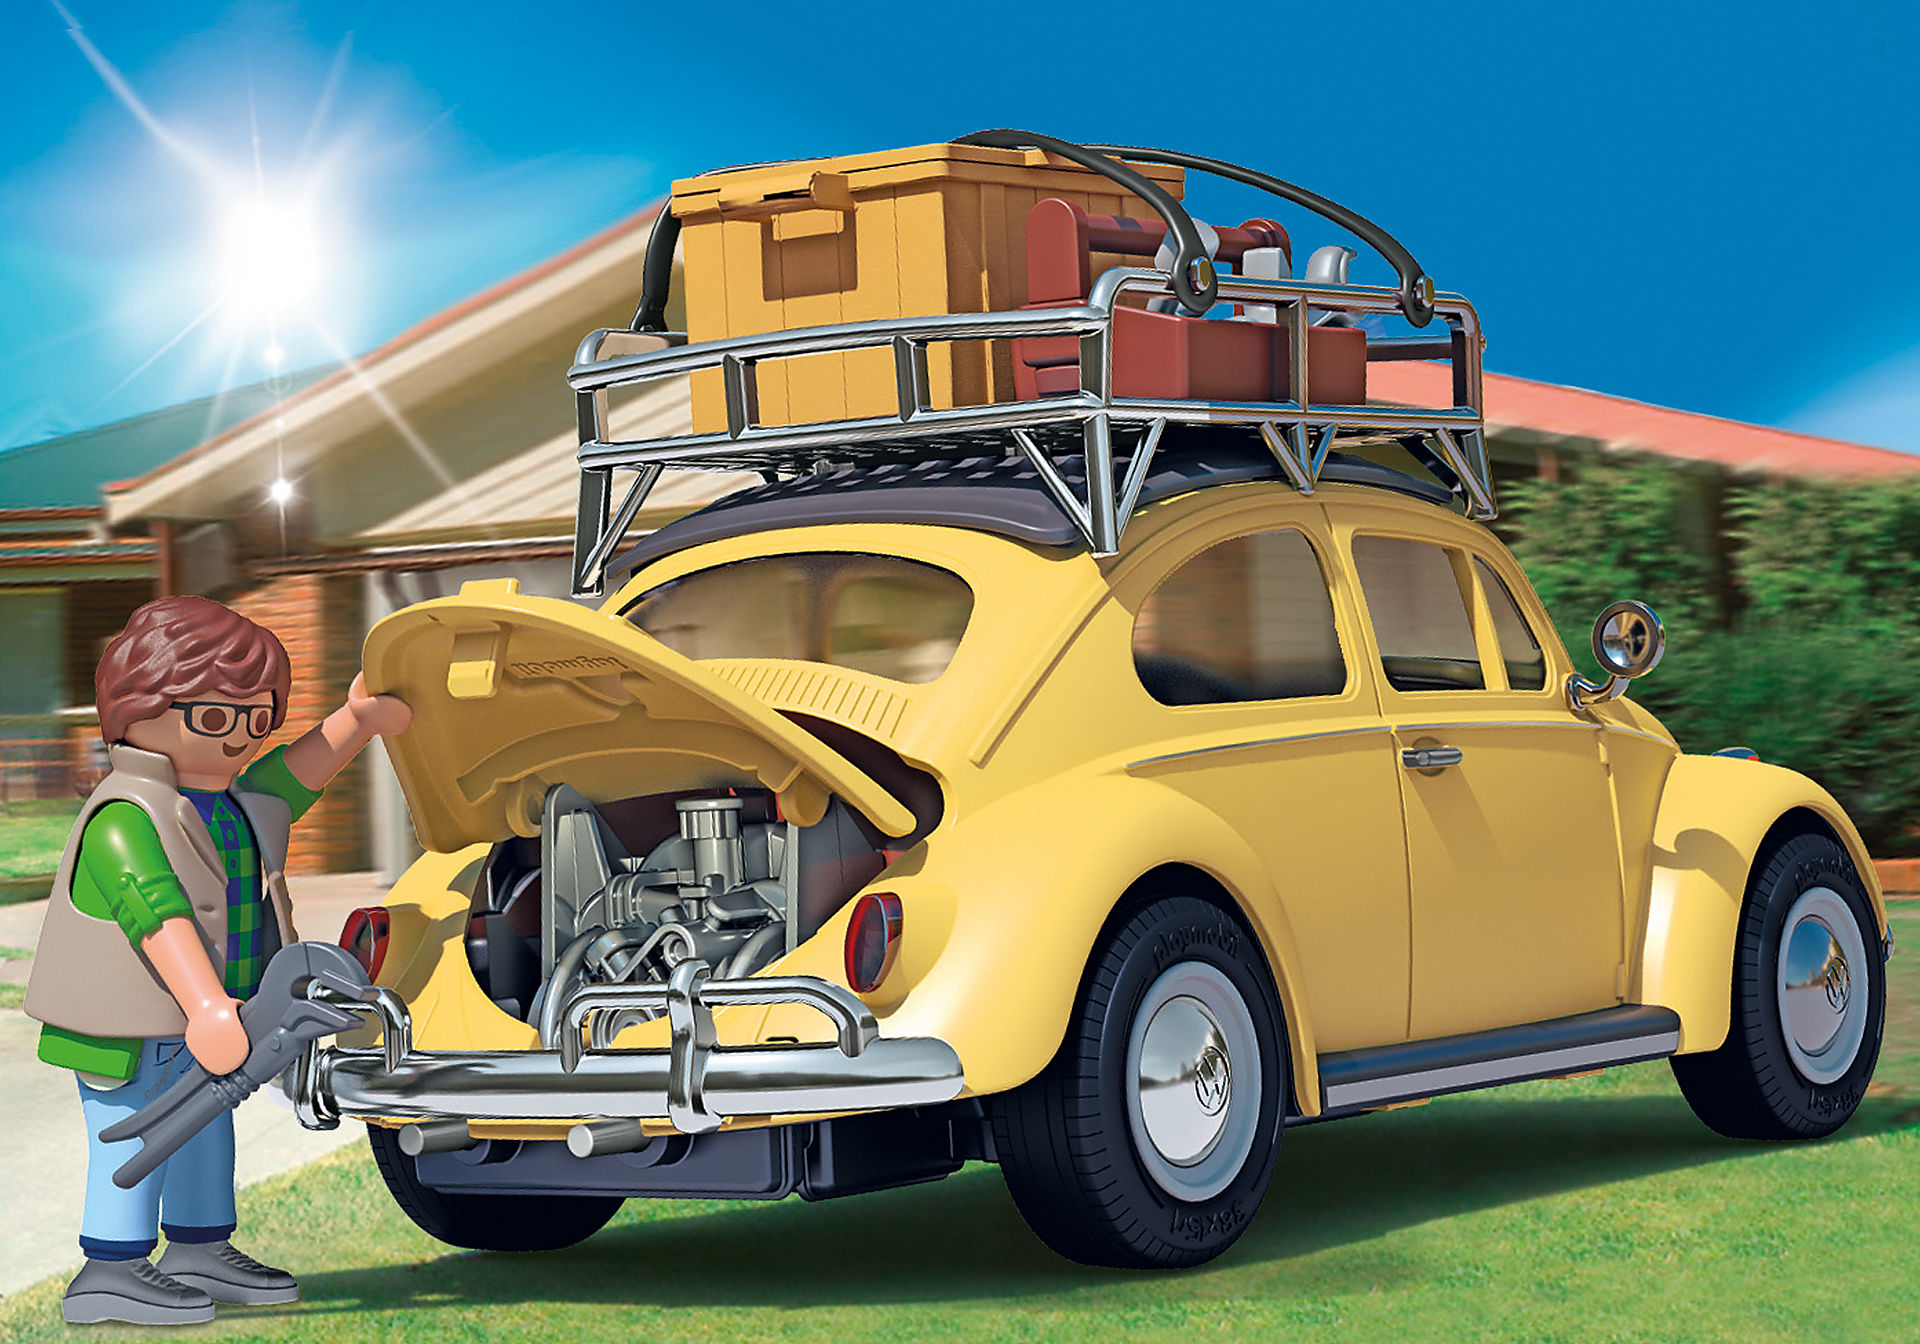 70827 Volkswagen Coccinelle - Edition spéciale zoom image6